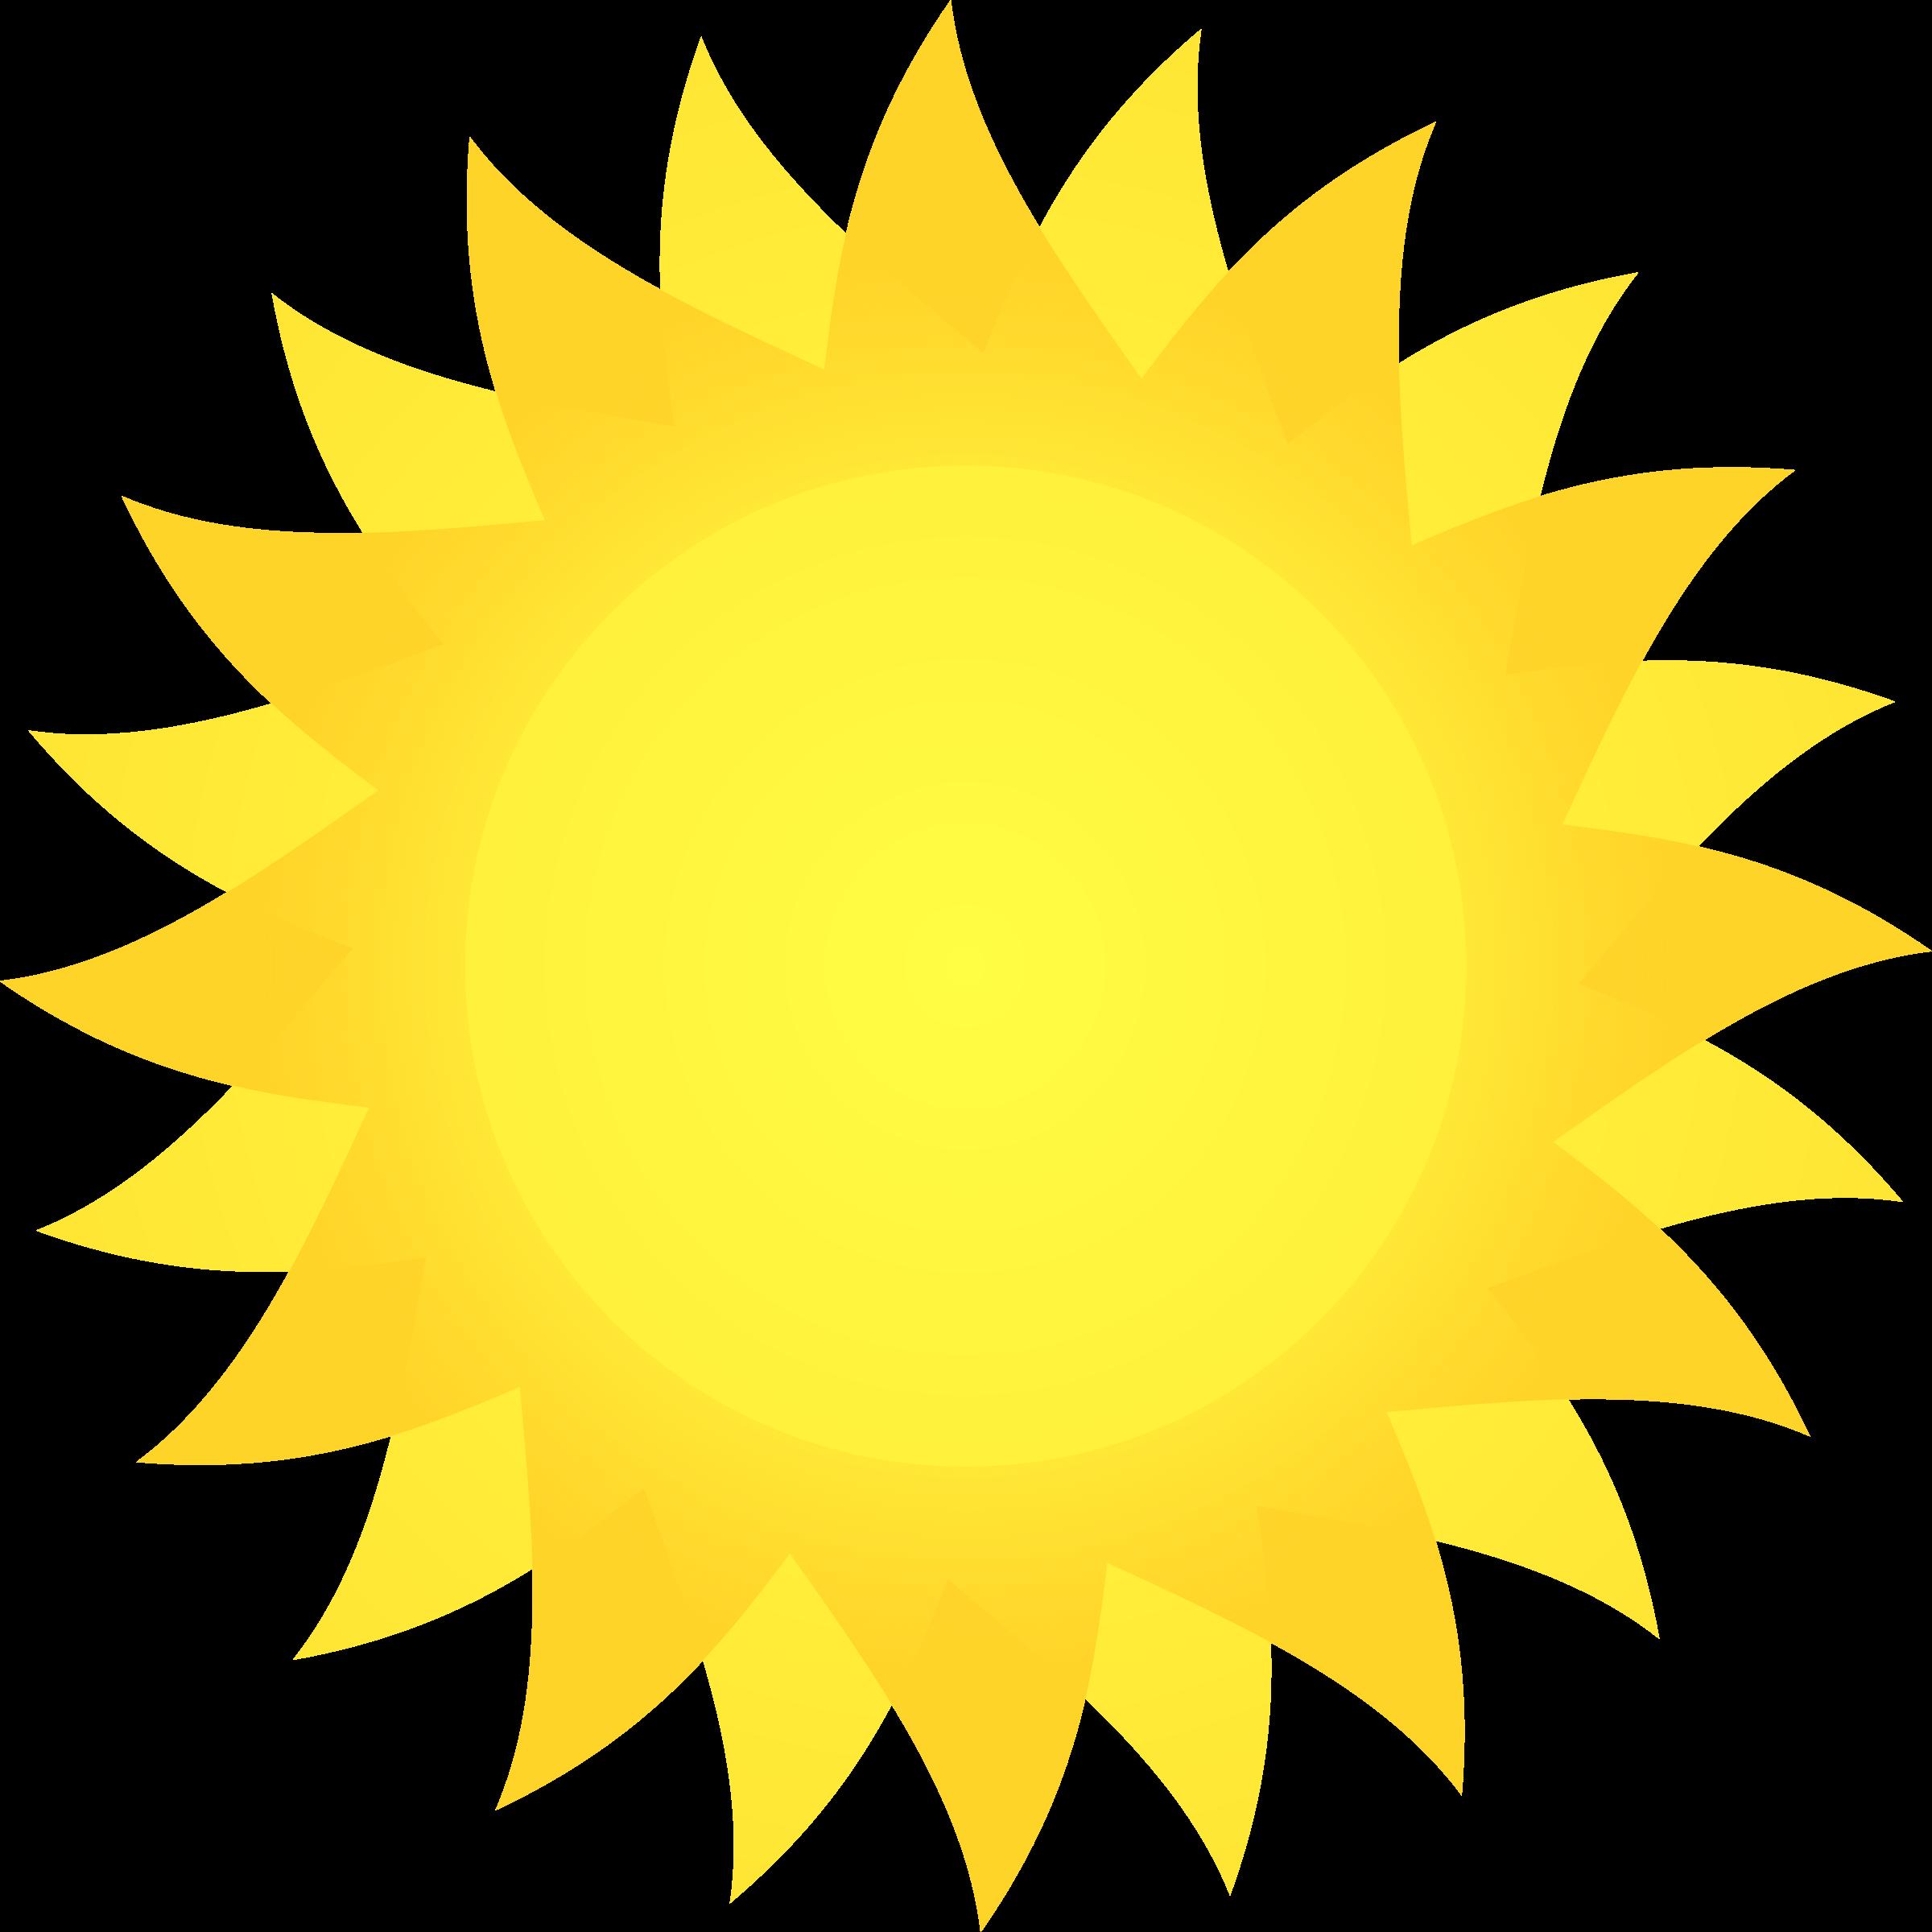 Sunny clipart scene sunny. Sun big image png